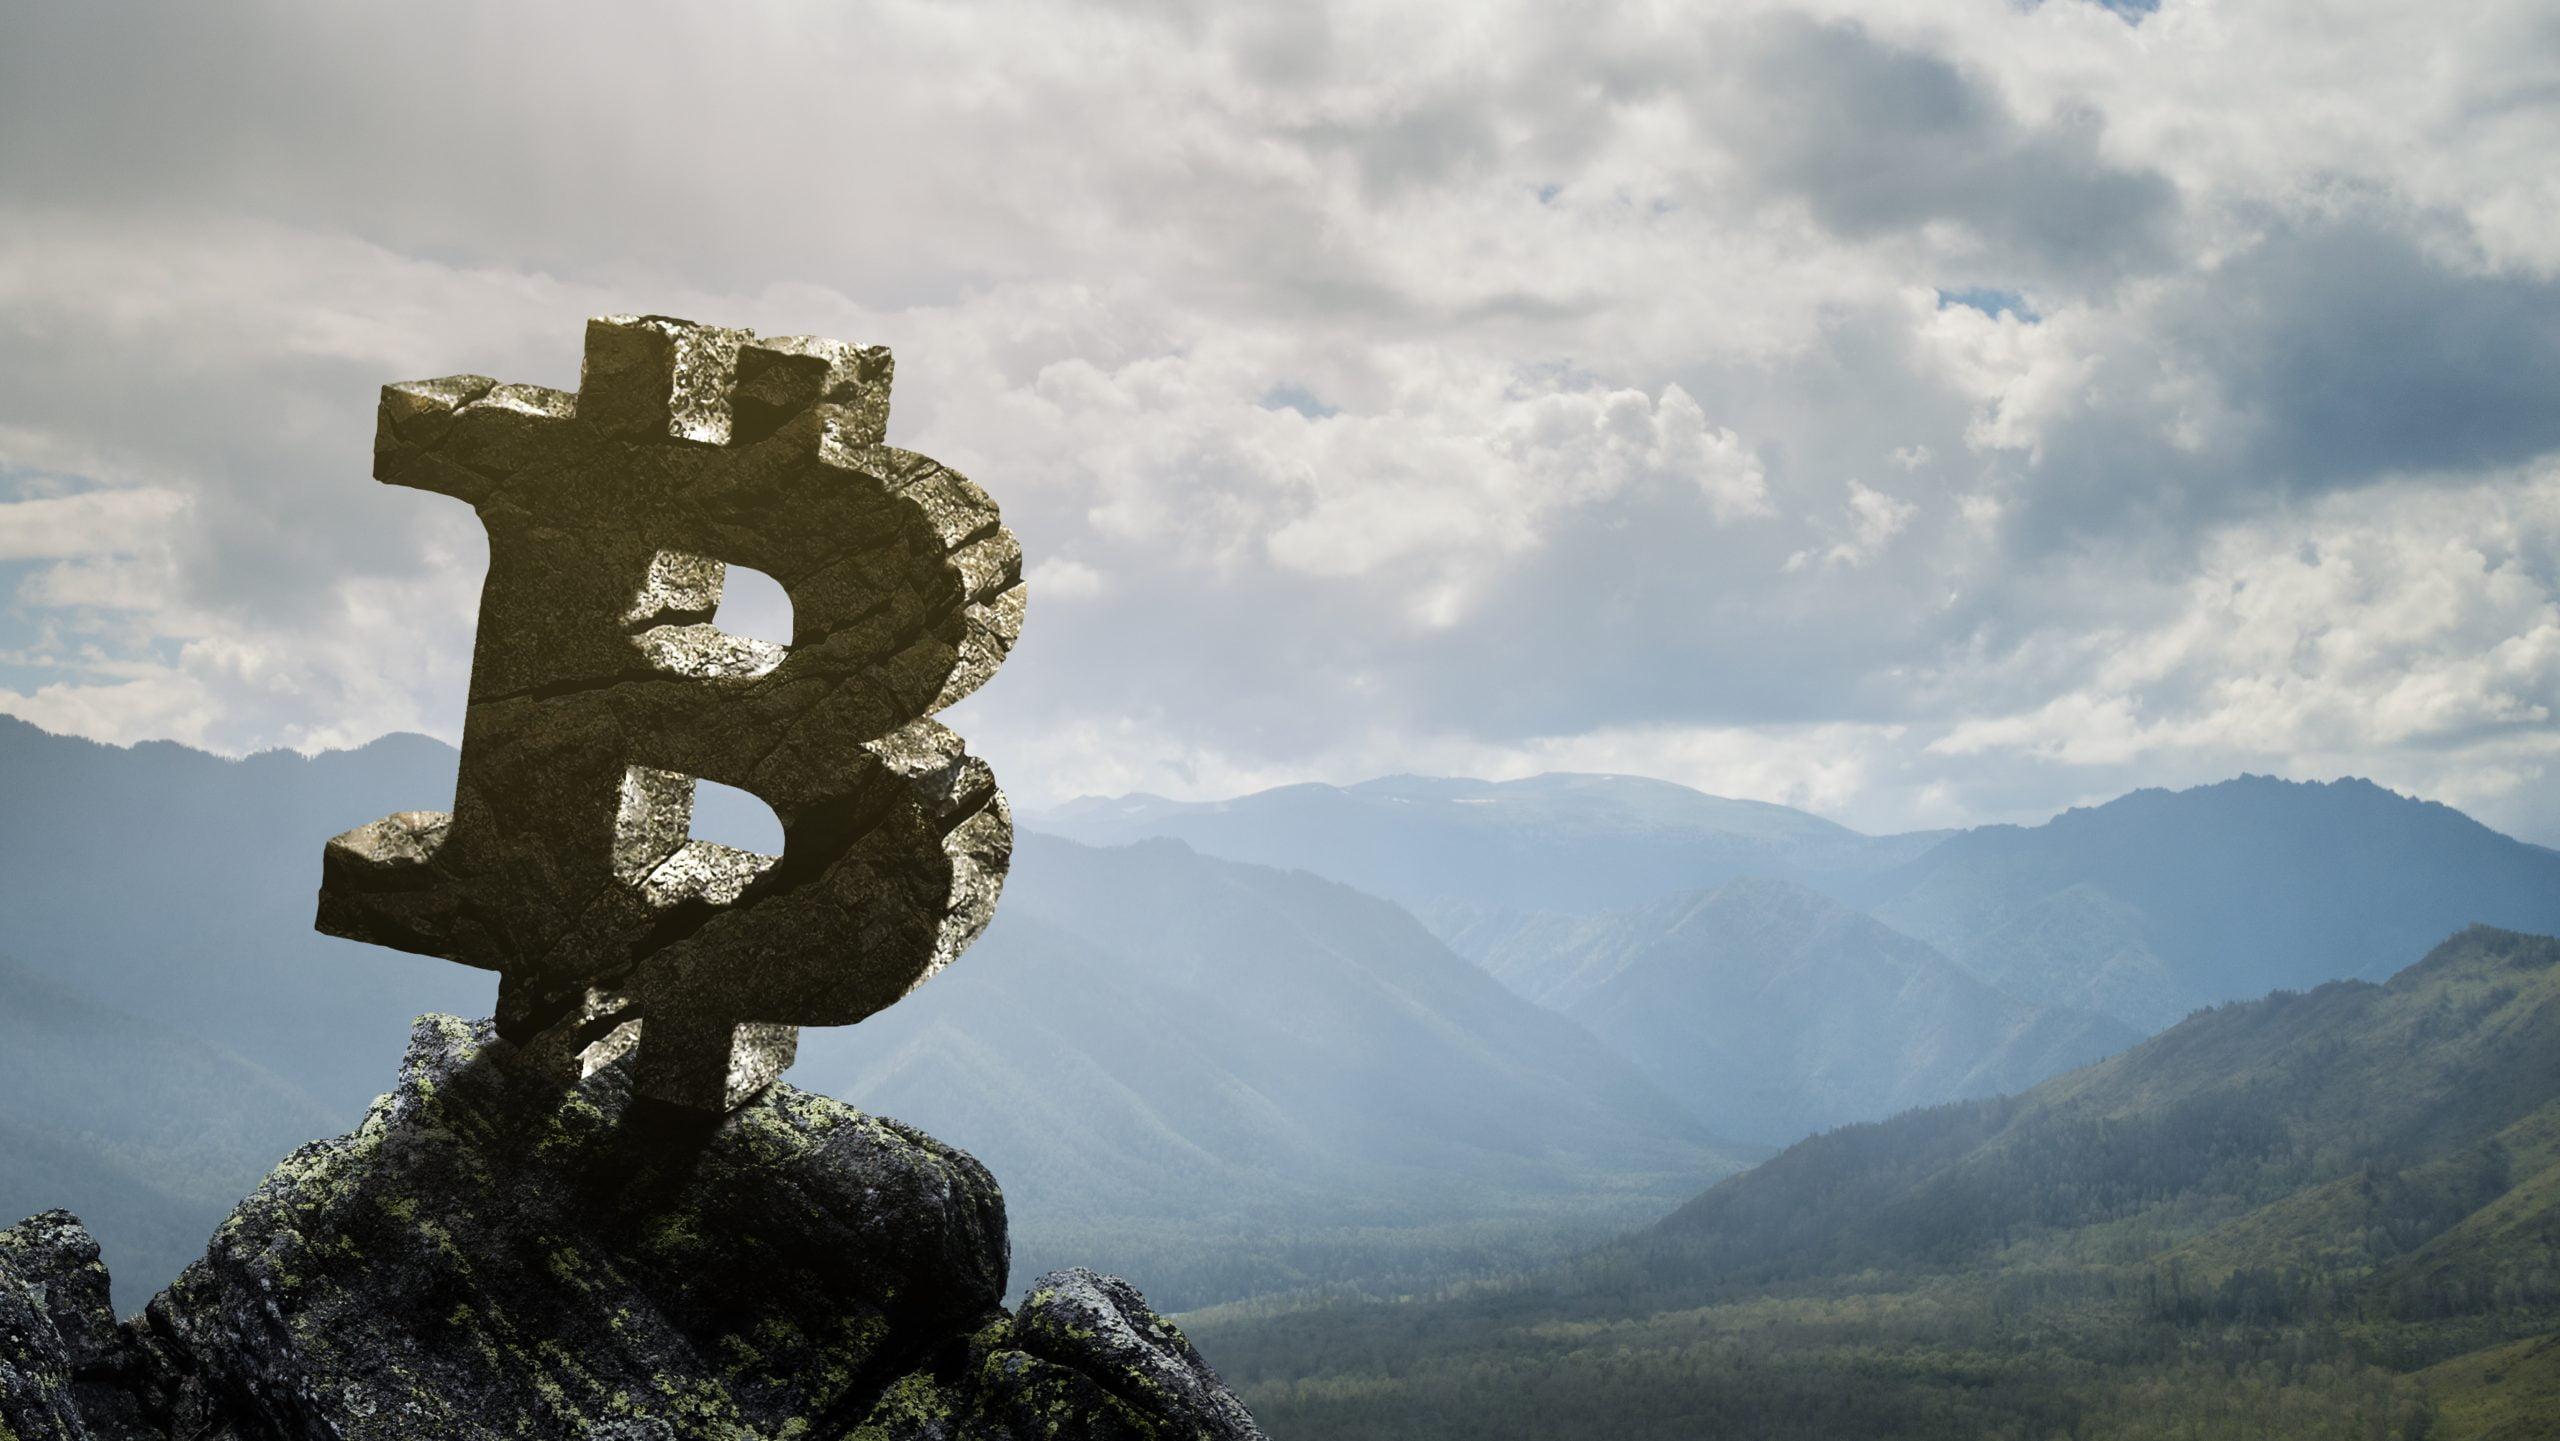 midas touch genel muduru grummes bitcoin cin yasagina ragmen 100 000 dolari hedefliyor